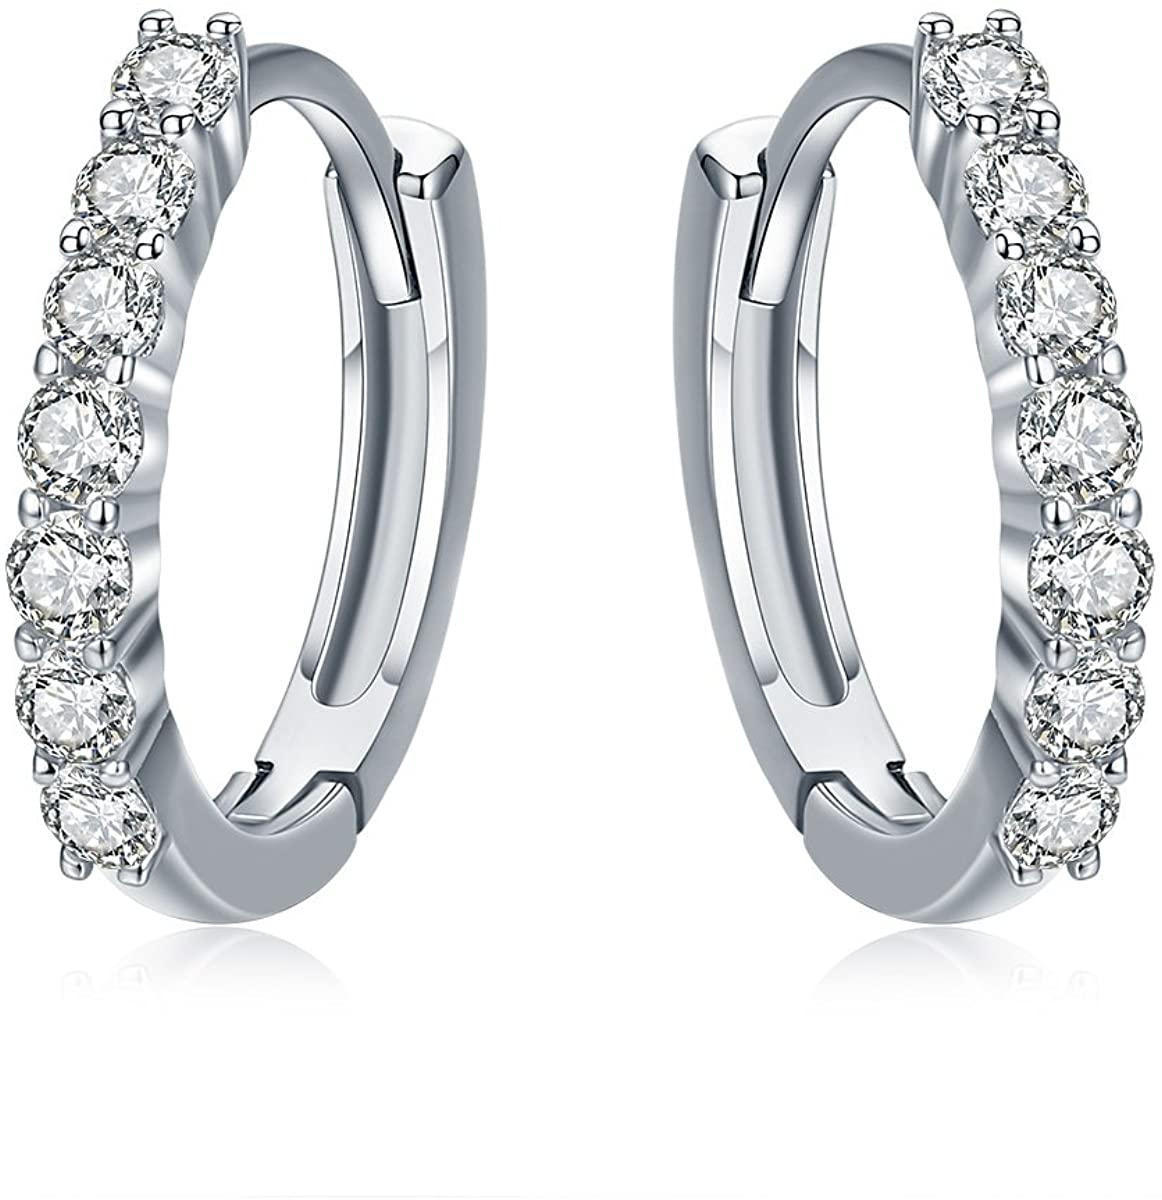 Sterling Silver Hoop Earrings Cubic Zirconia Huggie Earrings for Cartilage Jewellery Gift for Women Girls